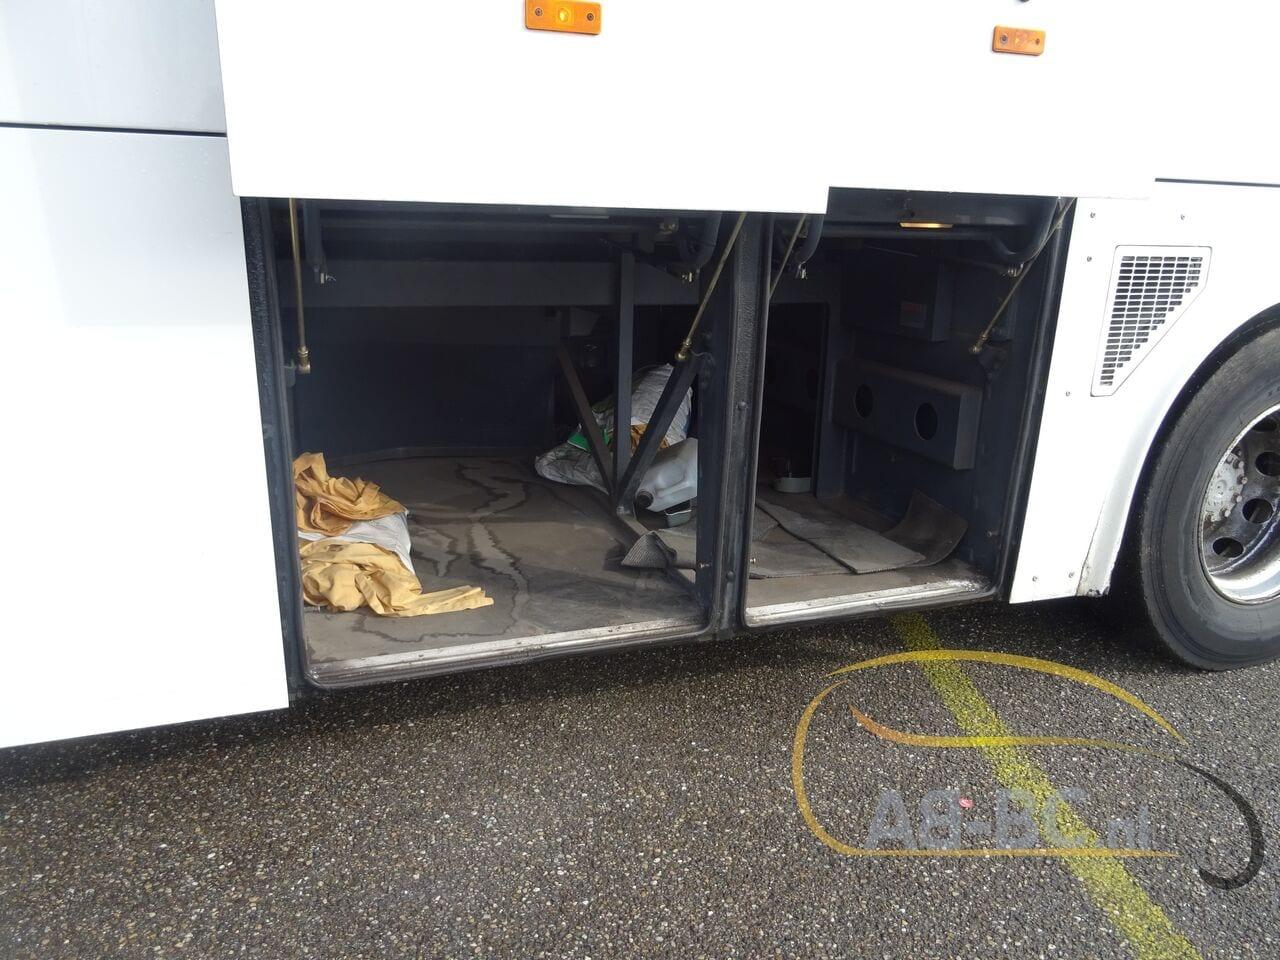 coach-busTEMSA-Safari-RD-65-Seats---1620311769869869915_big_149f729b76f6489c820adb81c3e2cfab--21050617272795316700